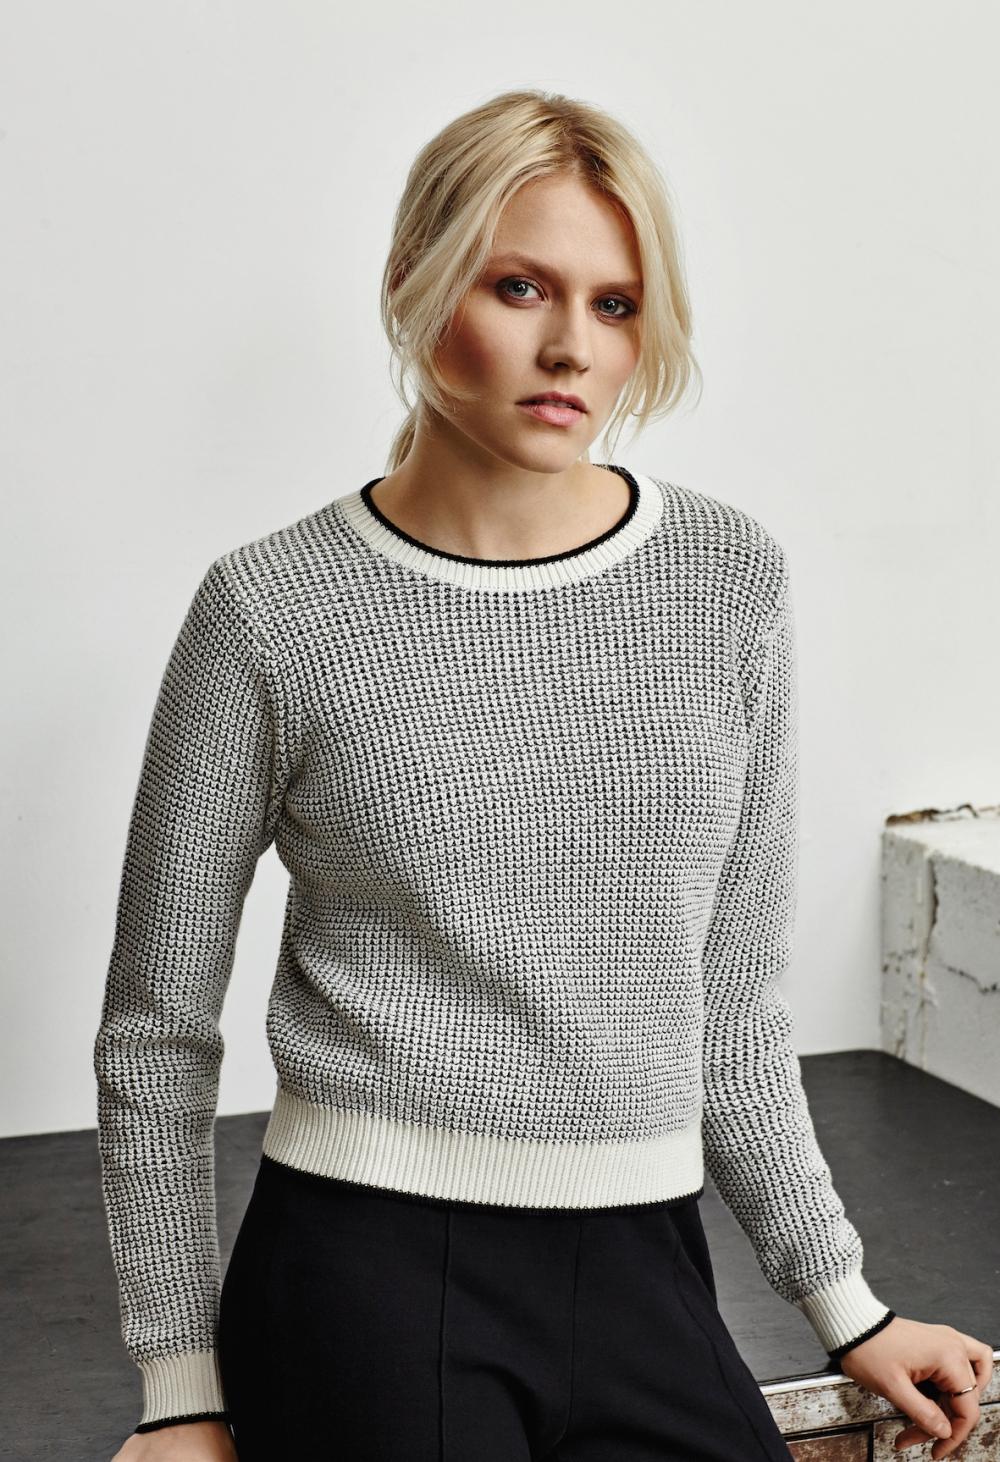 frieda-sand-organic-lady-fashion-grace-jumper-black-white